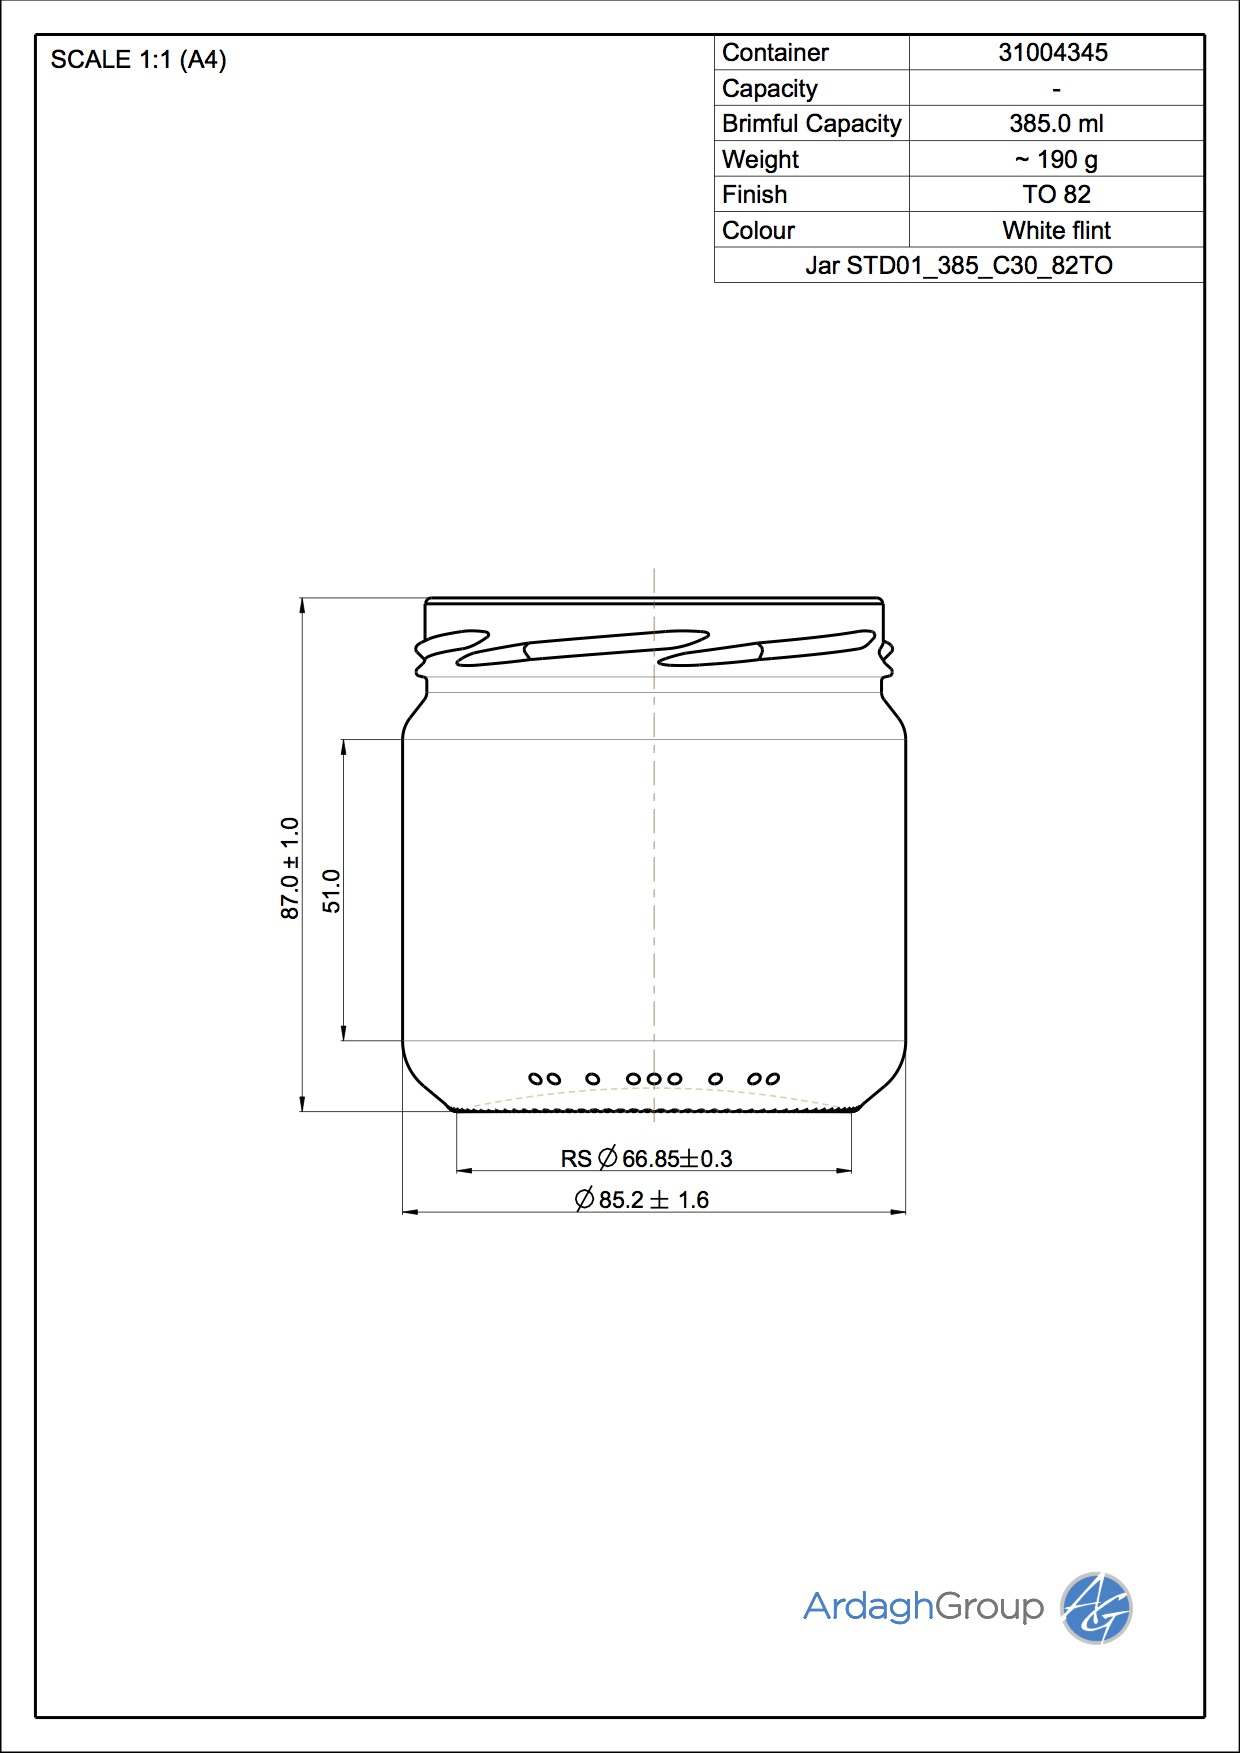 Jar STD01 385 C30 82TO